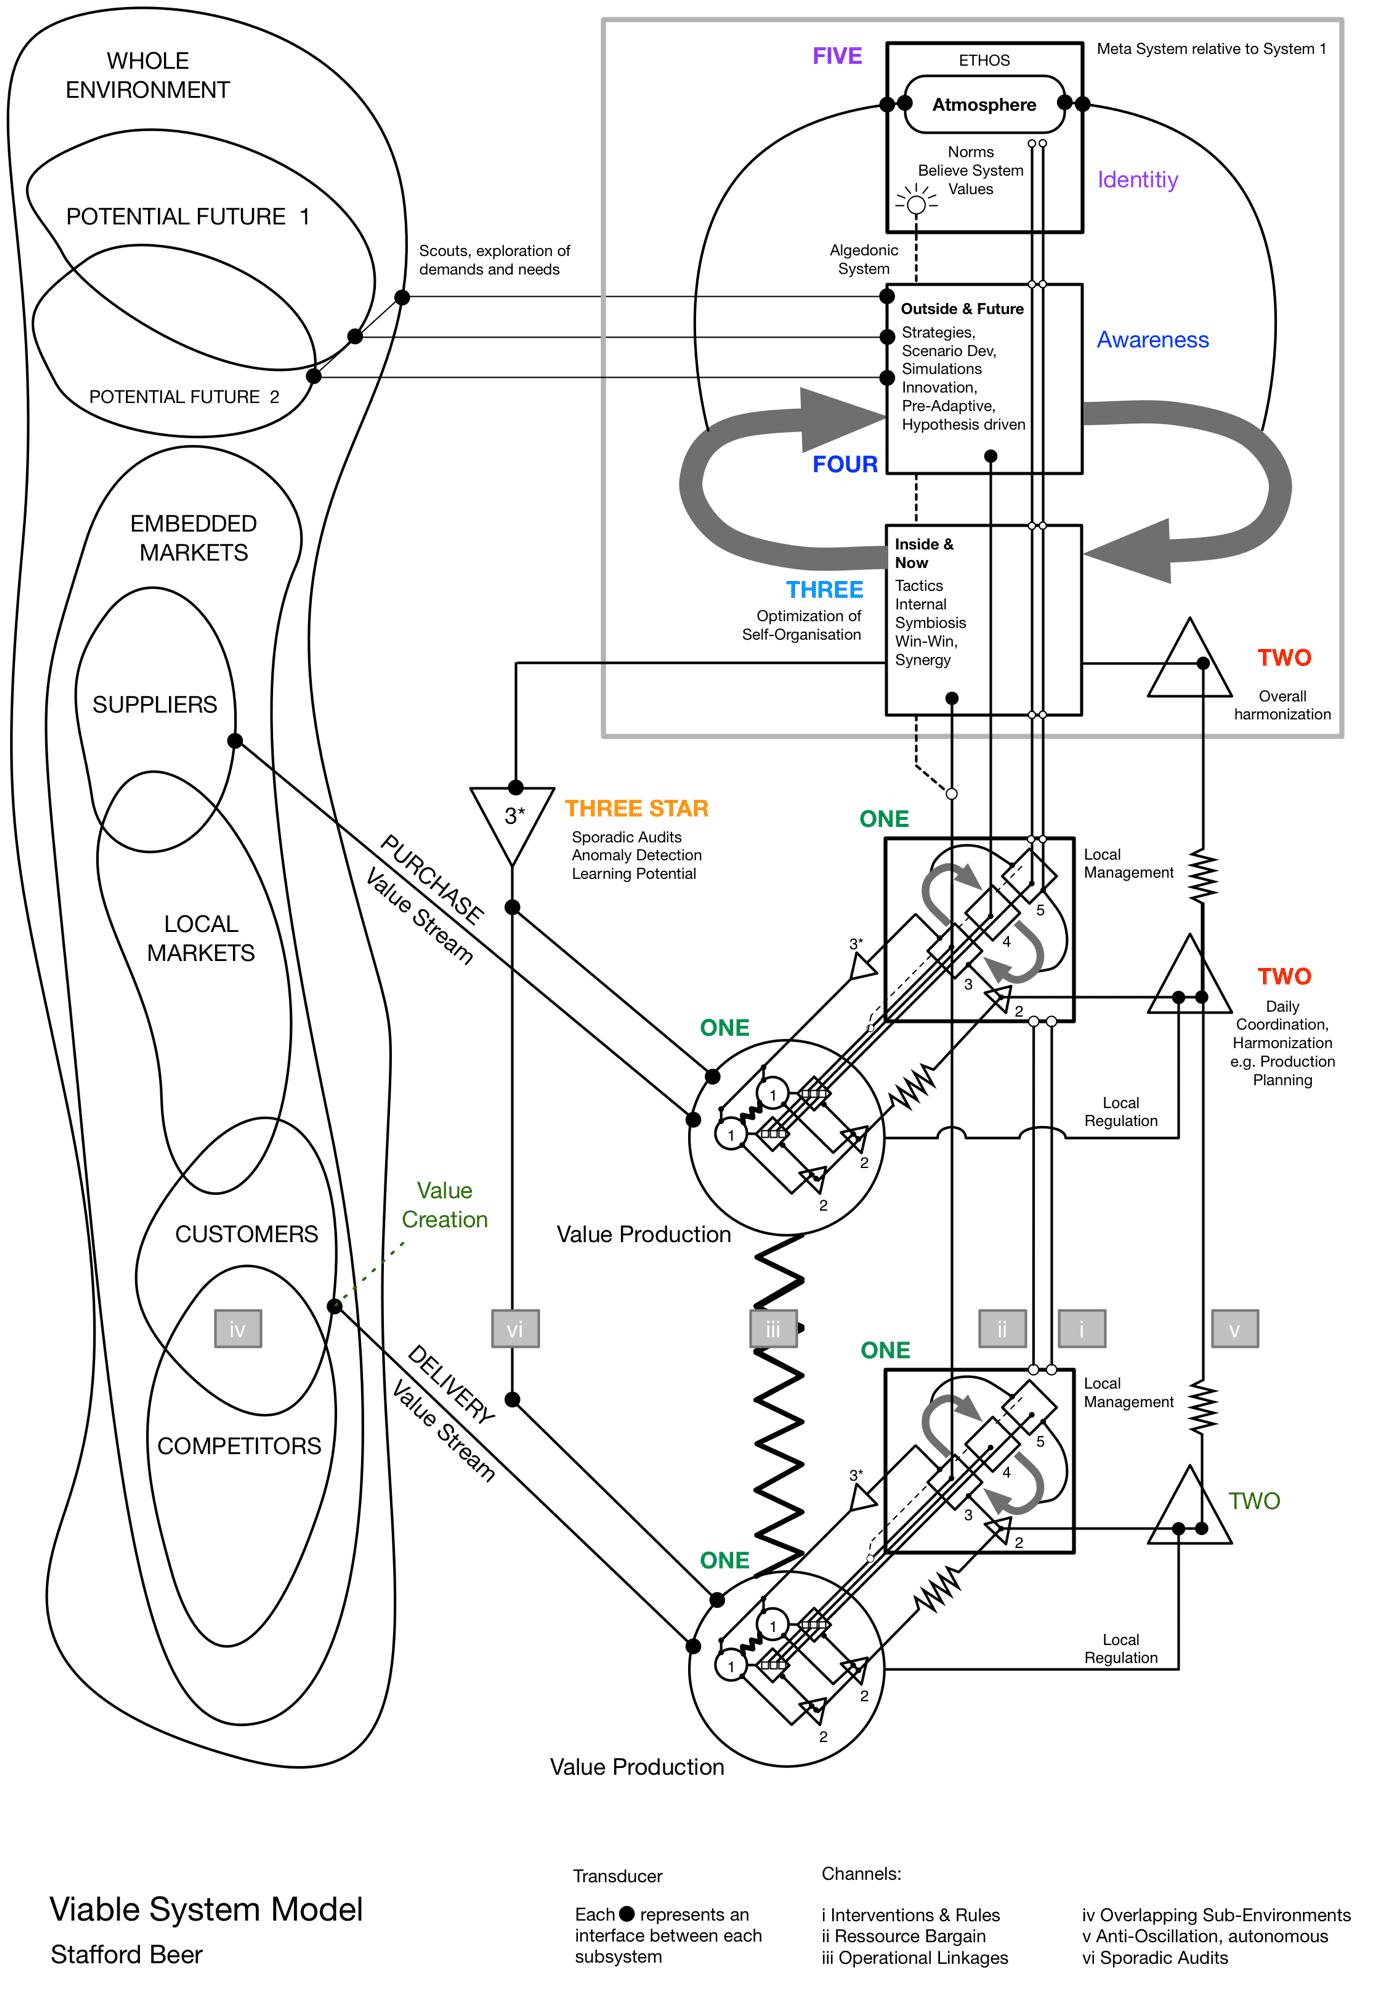 Viable System Model